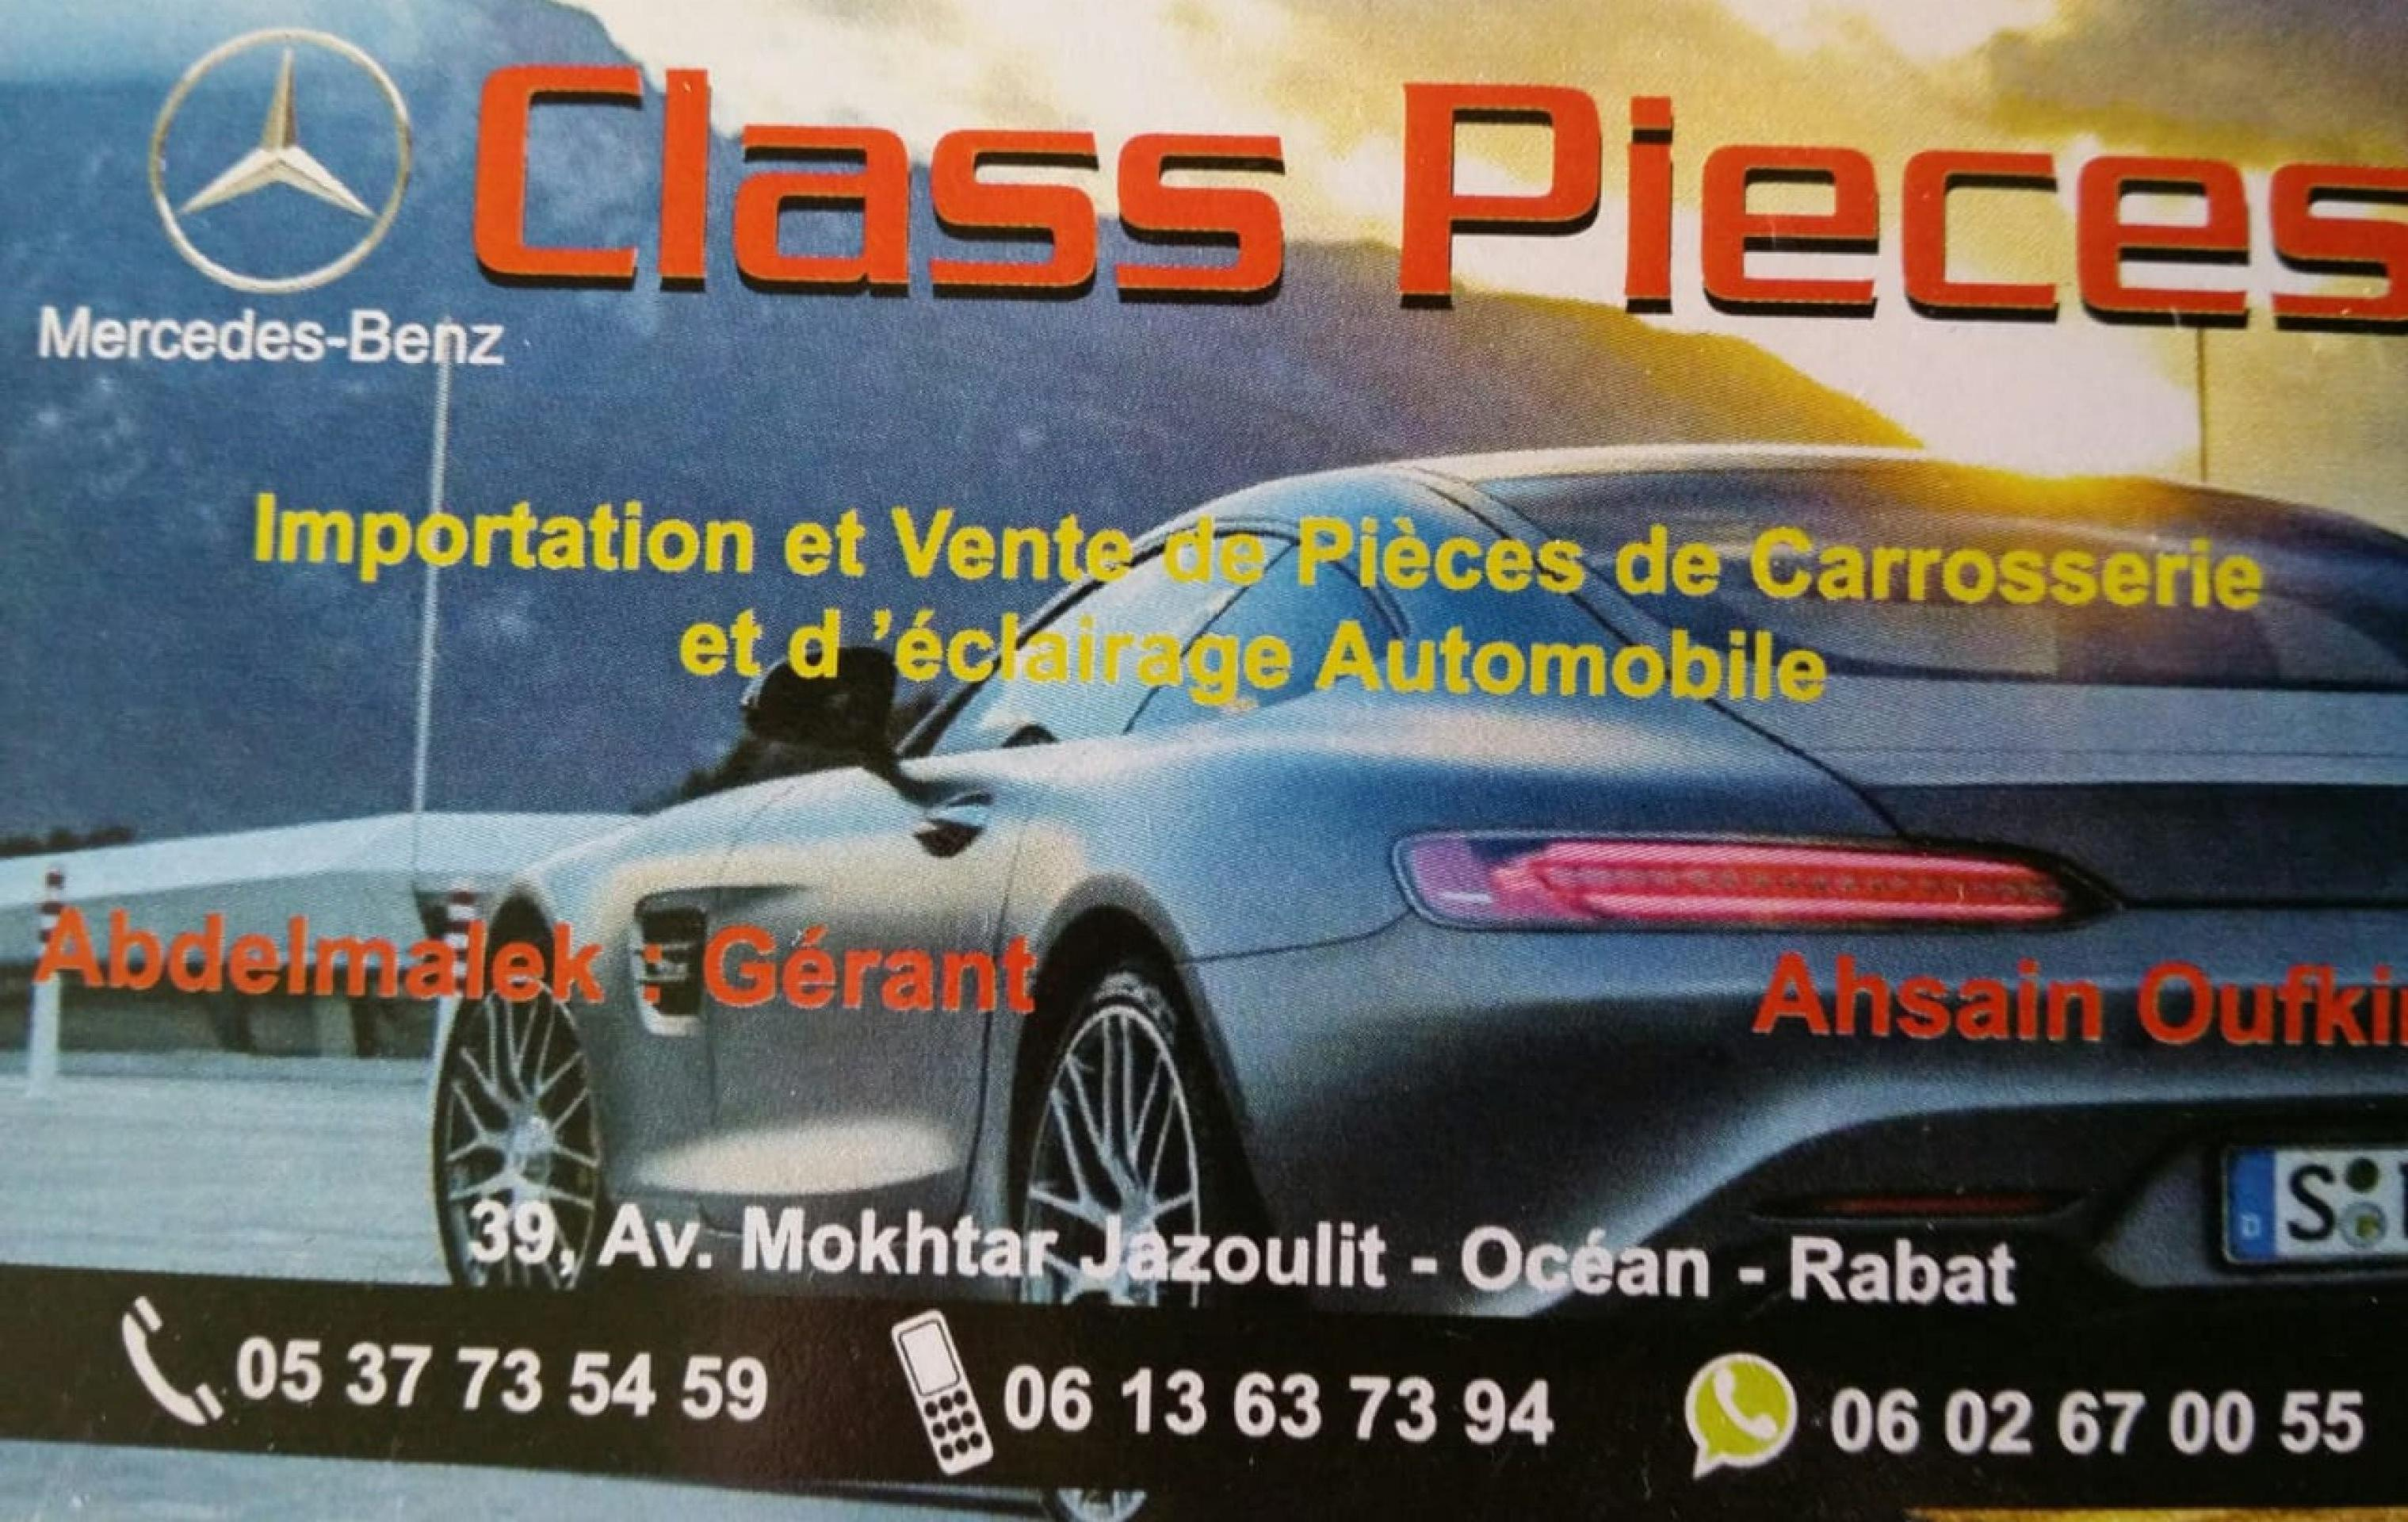 Mercedes Class pieces  logo